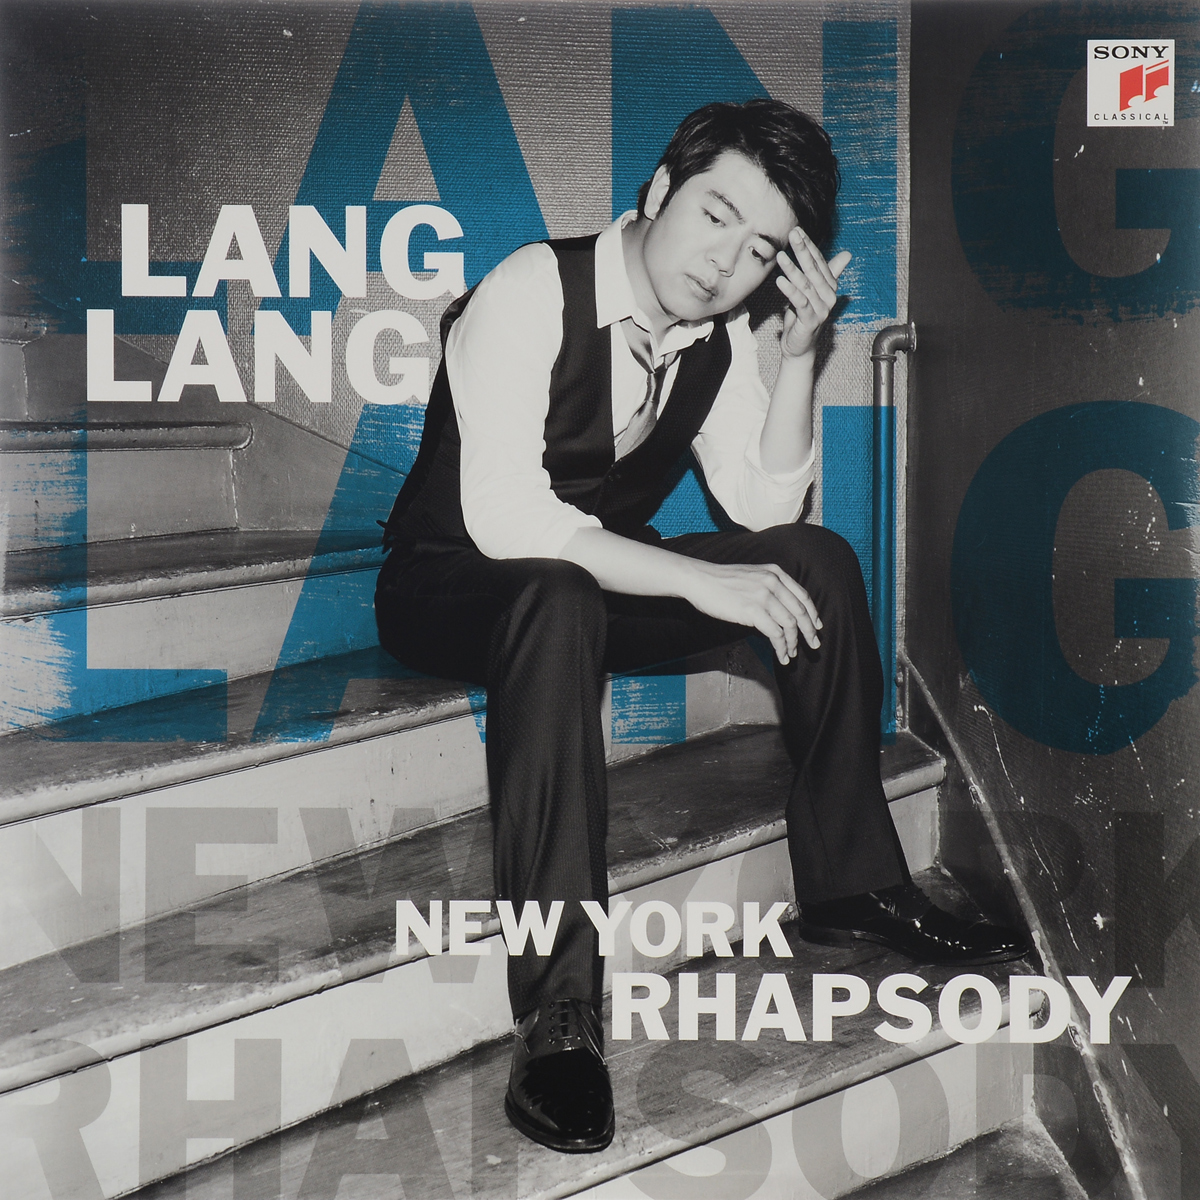 Ланг Ланг Lang Lang. New York Rhapsody (2 LP) new arcade jamma 60 in 1 kit w 2 joysticks 4 8 way